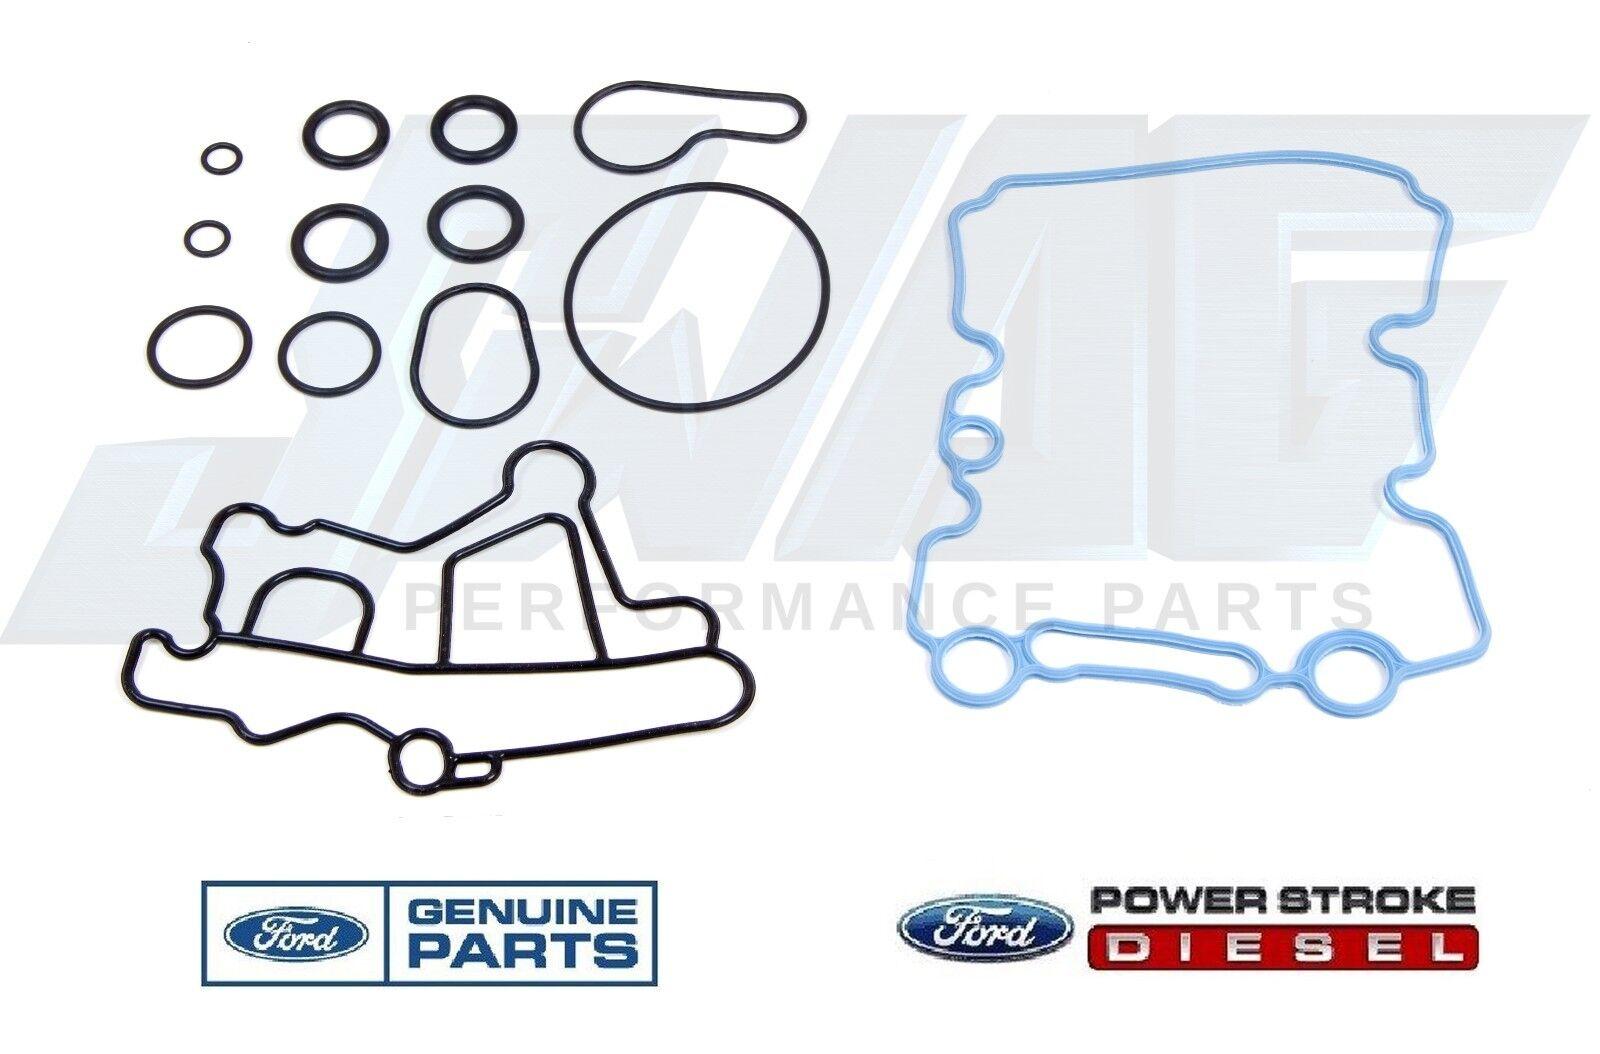 6.0L Powerstroke Diesel For Ford Oil Cooler Gasket Kit F250 F350 F450 F550 E350